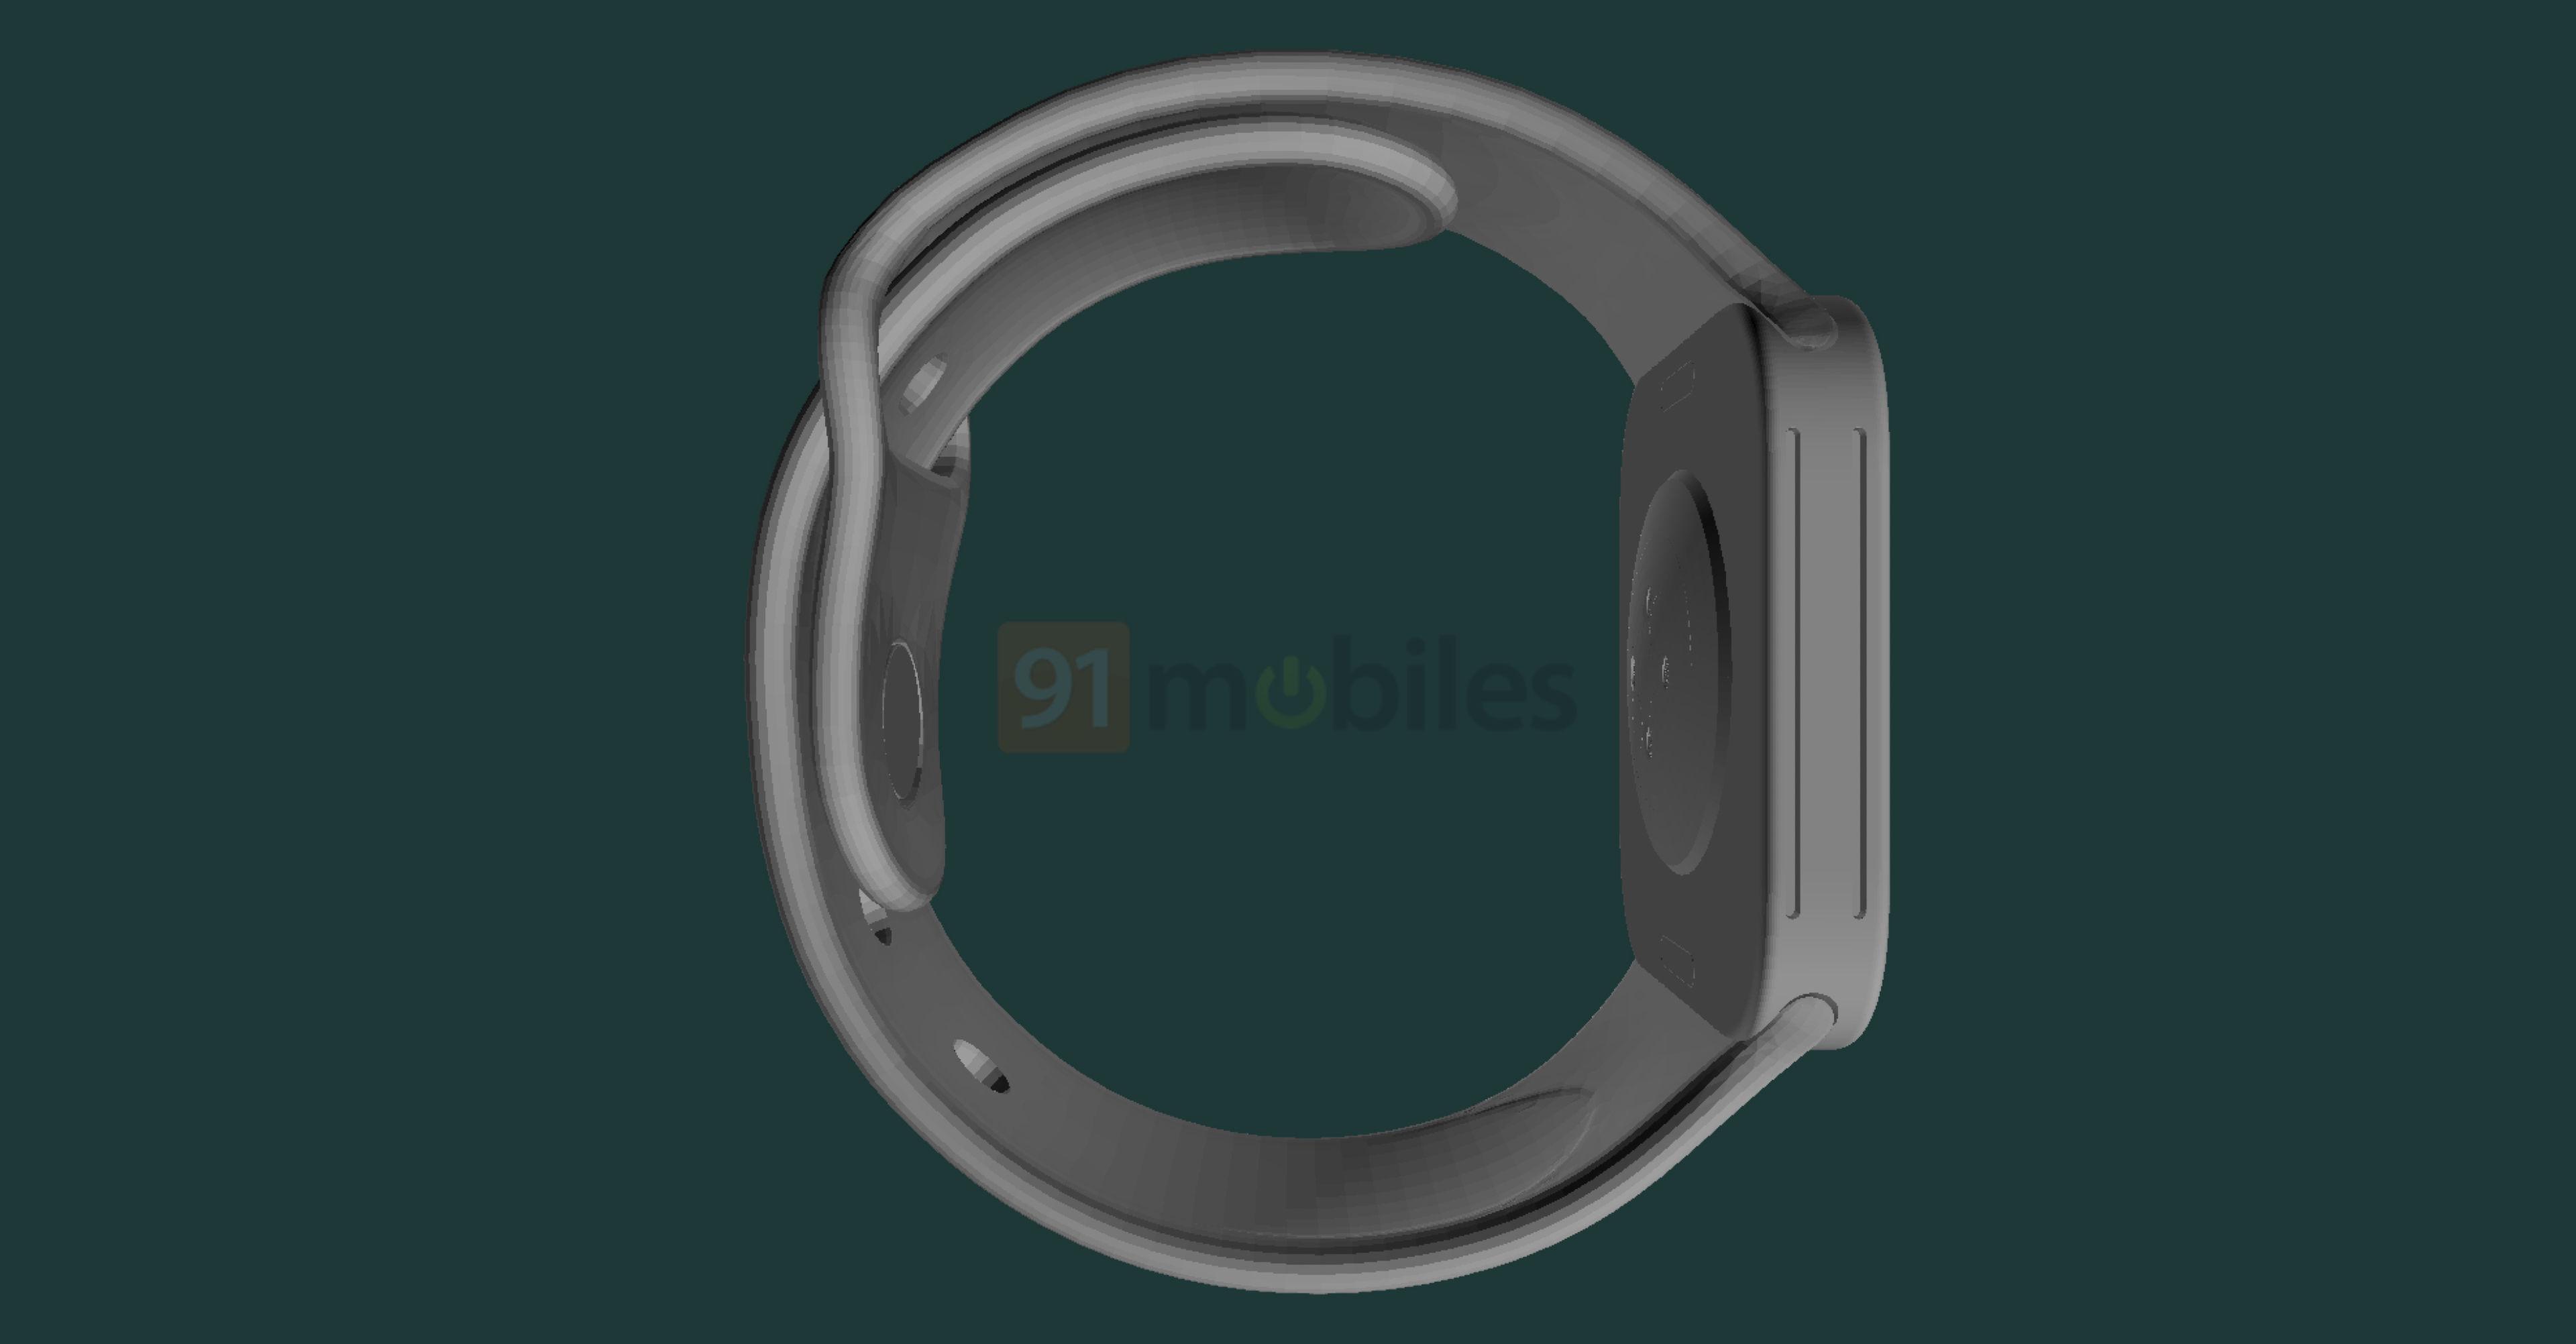 A CAD-based render of Apple Watch Series 7 showing expected design changes like bigger speaker grilles on the left side